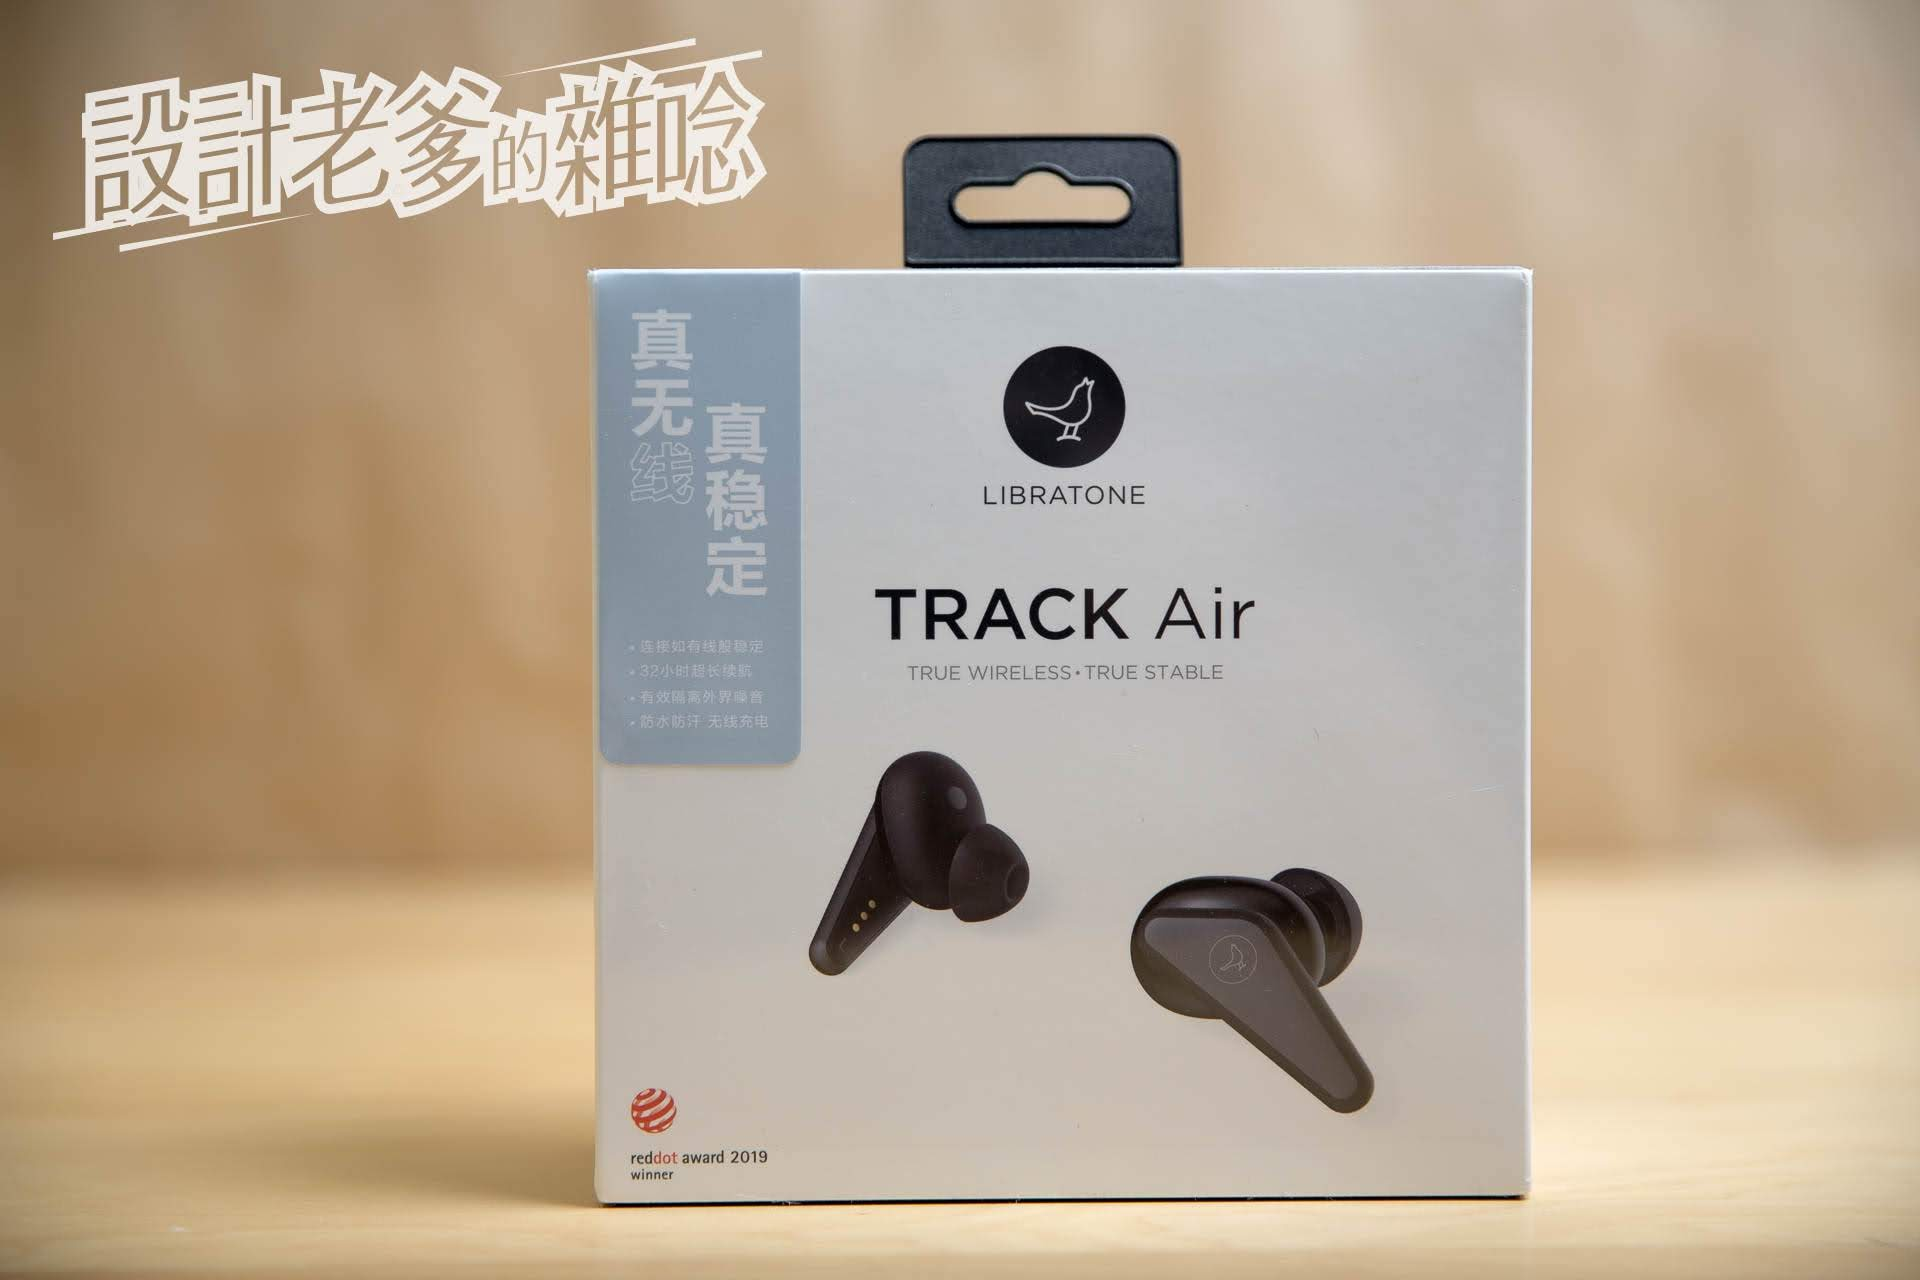 LIBRATONE TRACK Air 真無線藍牙耳機...這源自北歐的小鳥音響,是淘寶必買2019,拿在手上,你會驚訝它的小巧